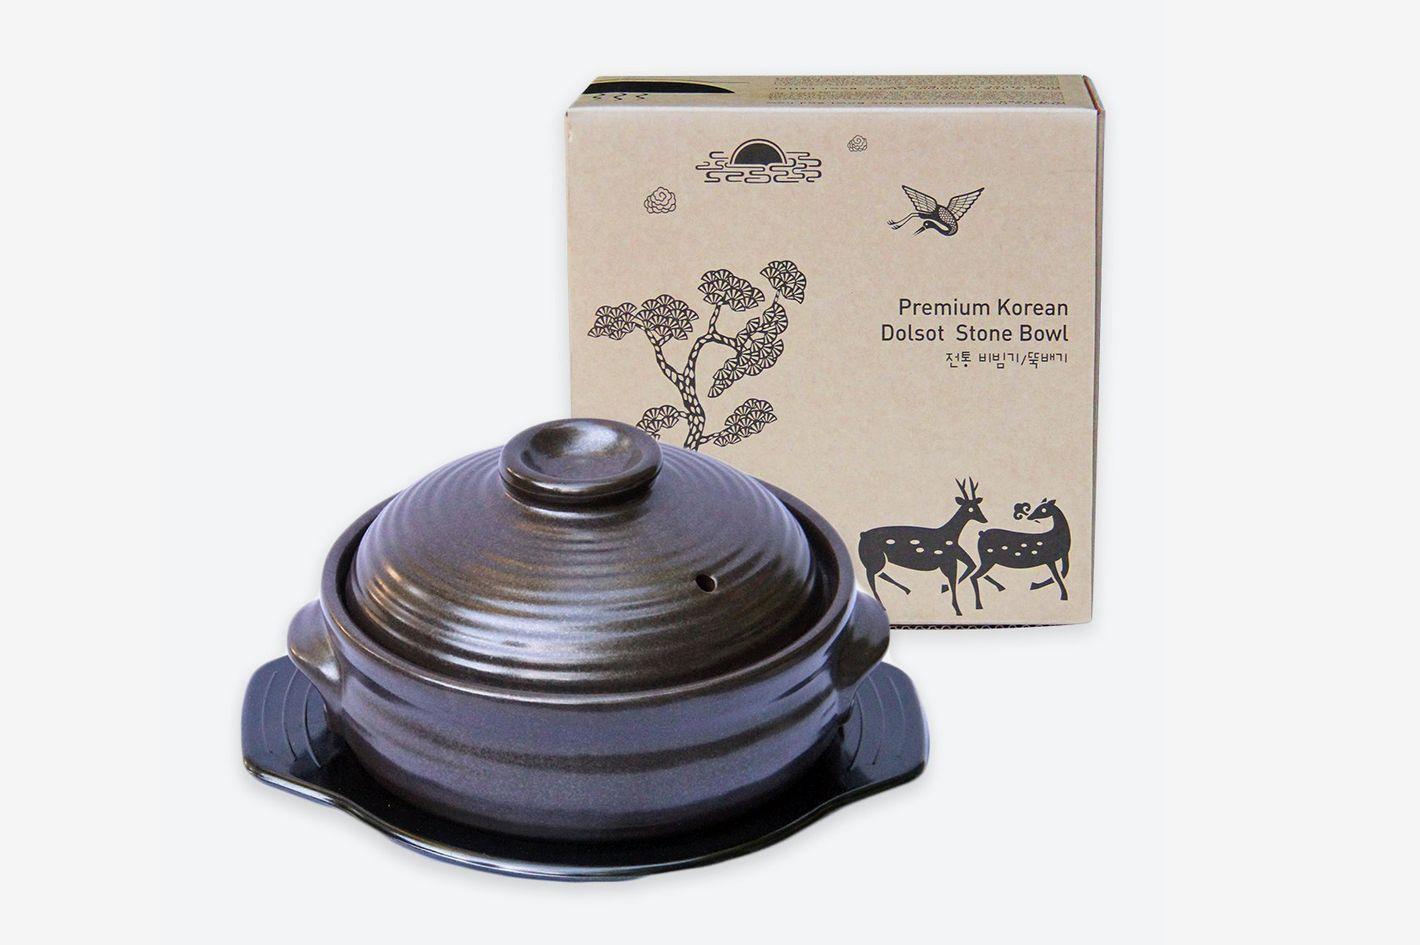 Crazy Korean Cooking Stone Hot Pot